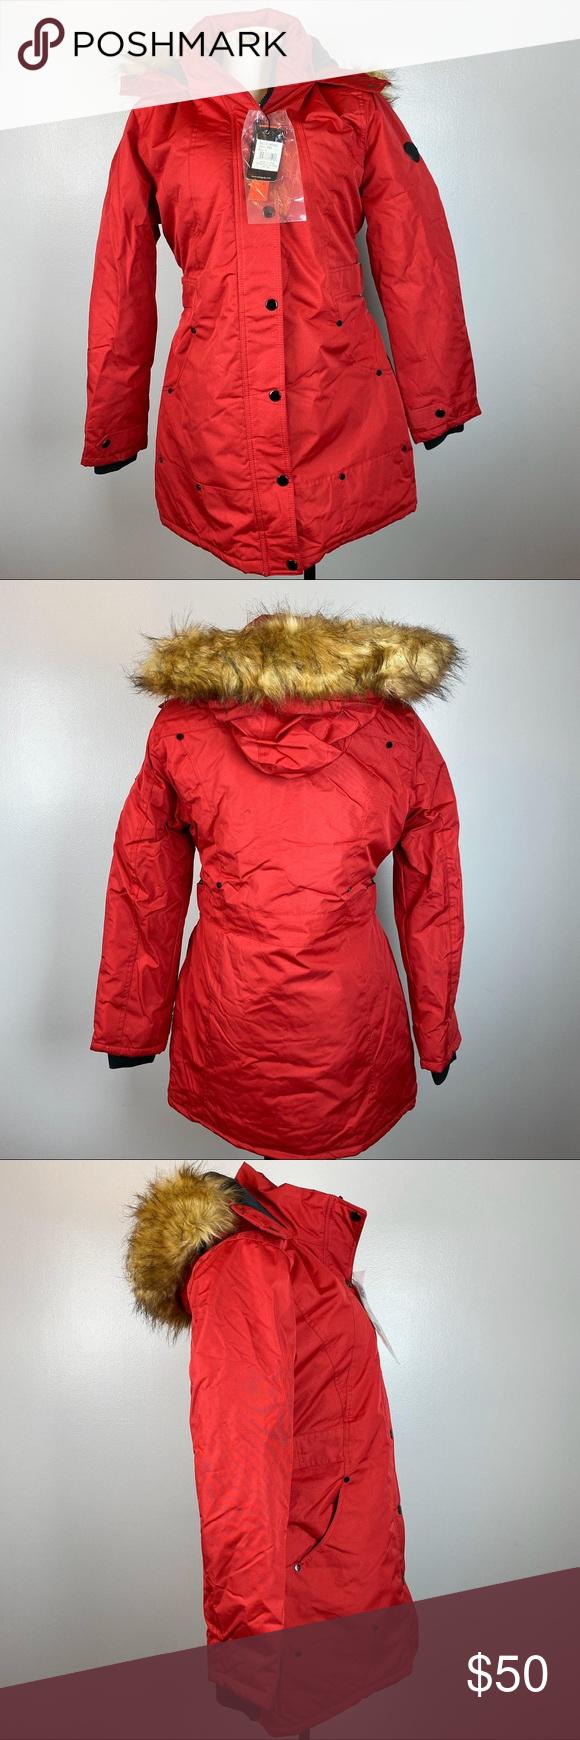 Yoki Womens Red Puffer Jacket Size M Nwt Yoki Womens Red Puffer Jacket Size M Nwt Yoki Jackets Coats Puffers Red Puffer Jacket Lady In Red Puffer Jackets [ 1740 x 580 Pixel ]